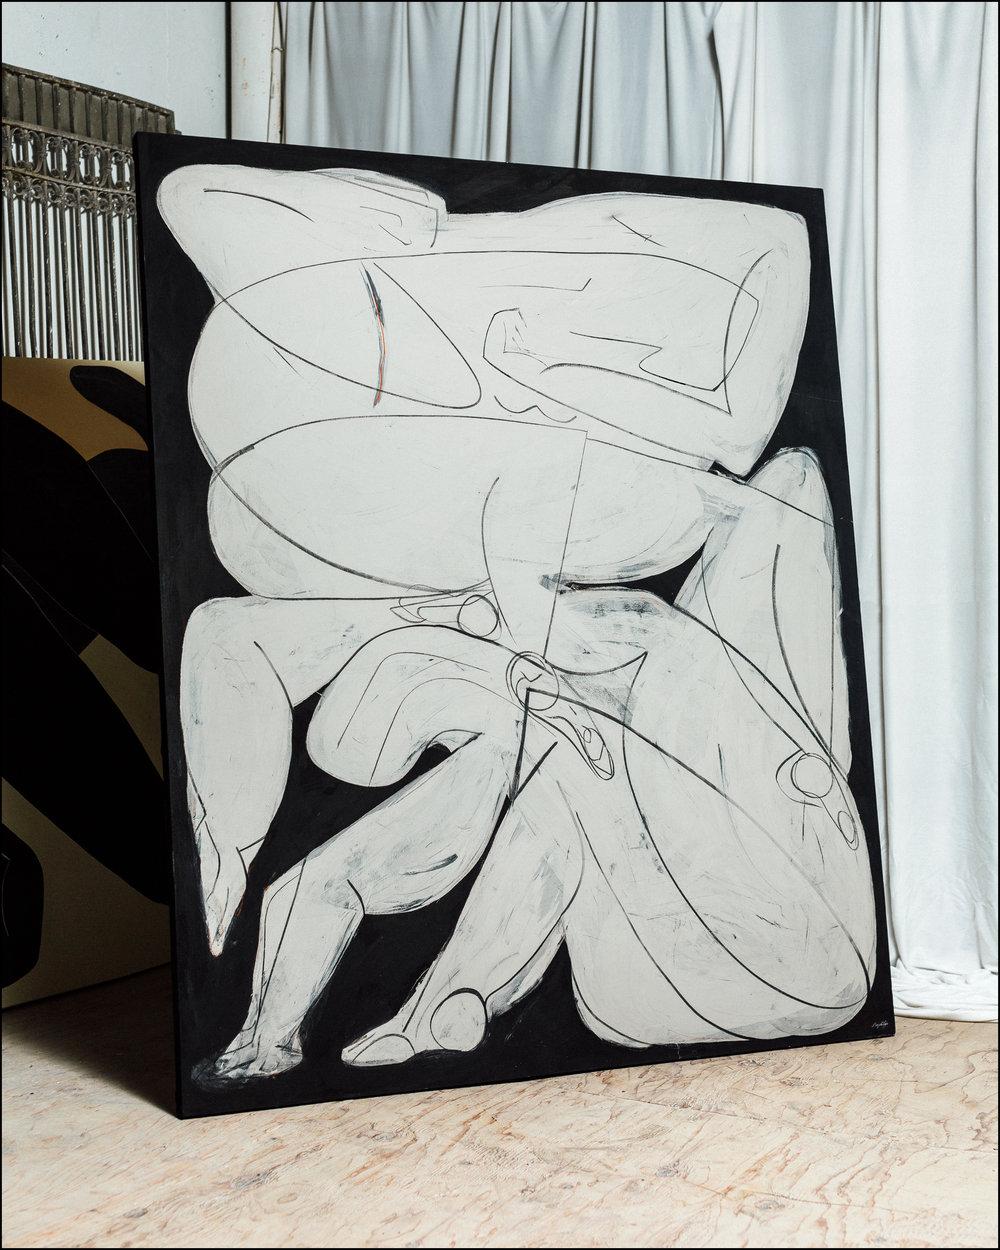 Censure  - 2018 - Tempura, Charcoal & Oil Pastel on Canvas - 60 x 72 Inches (152.4 x 182.8cm) - $8,000 USD